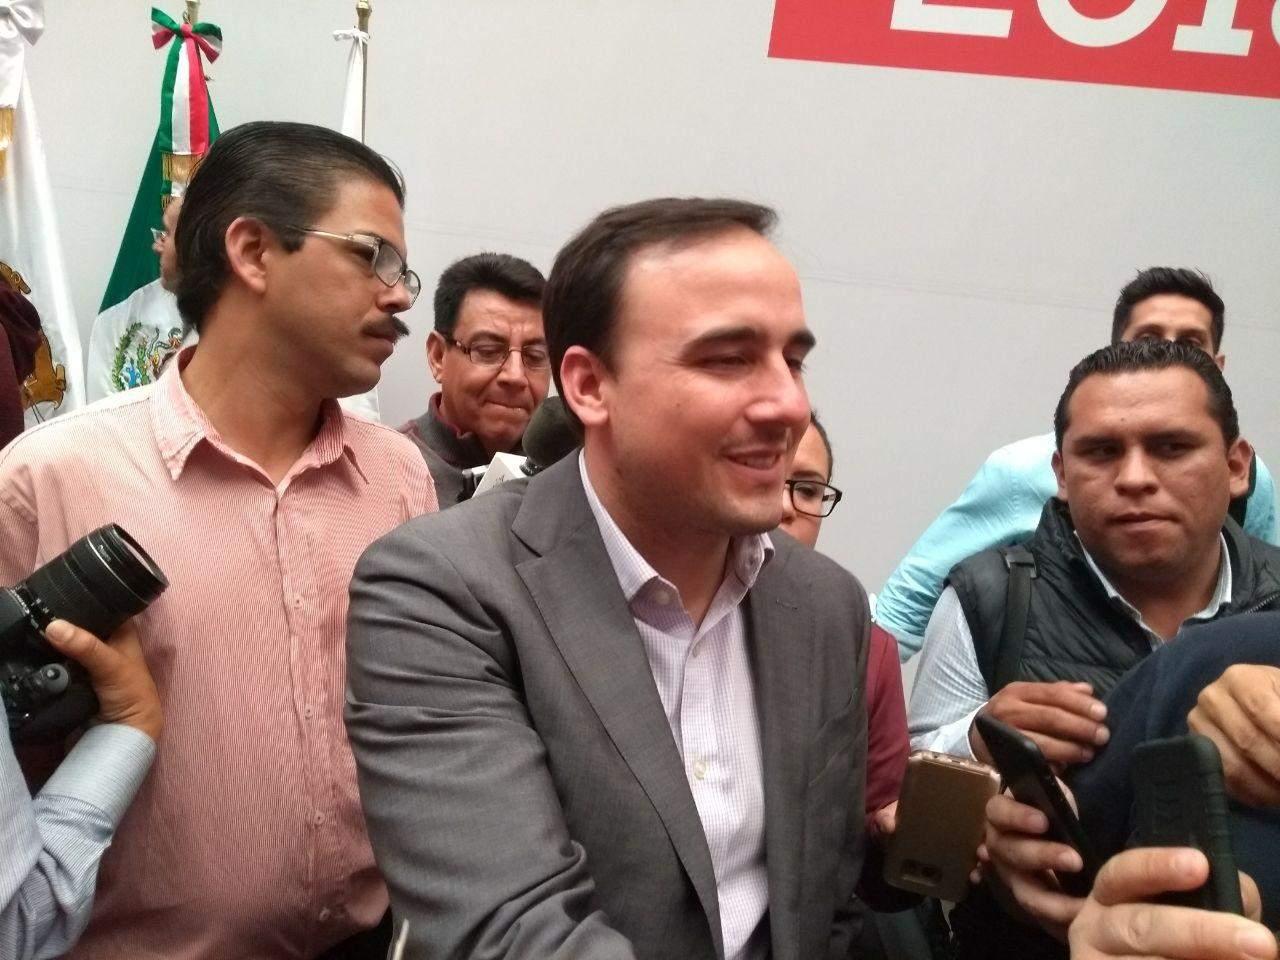 Teleférico se colocaría en centro de Saltillo: alcalde